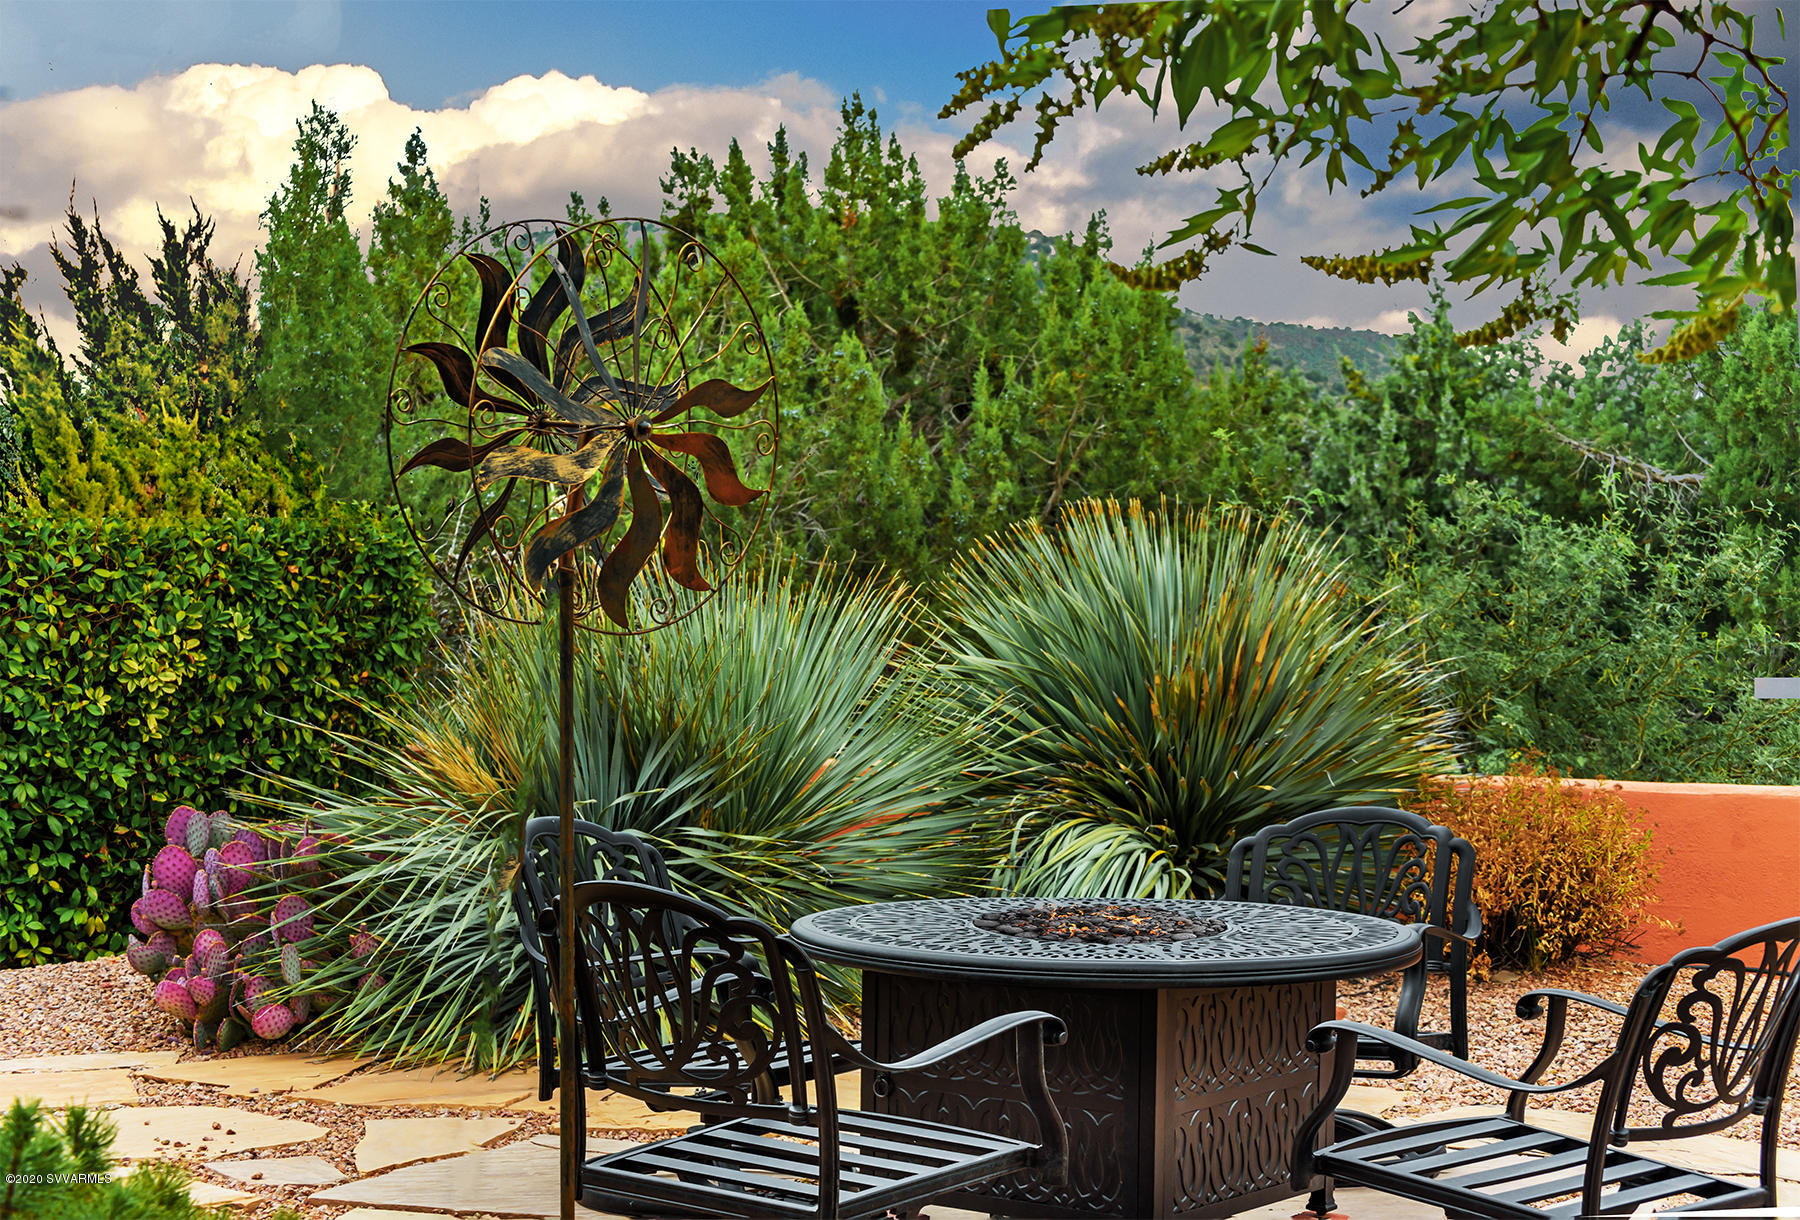 170 White Tail Drive Sedona, AZ 86351